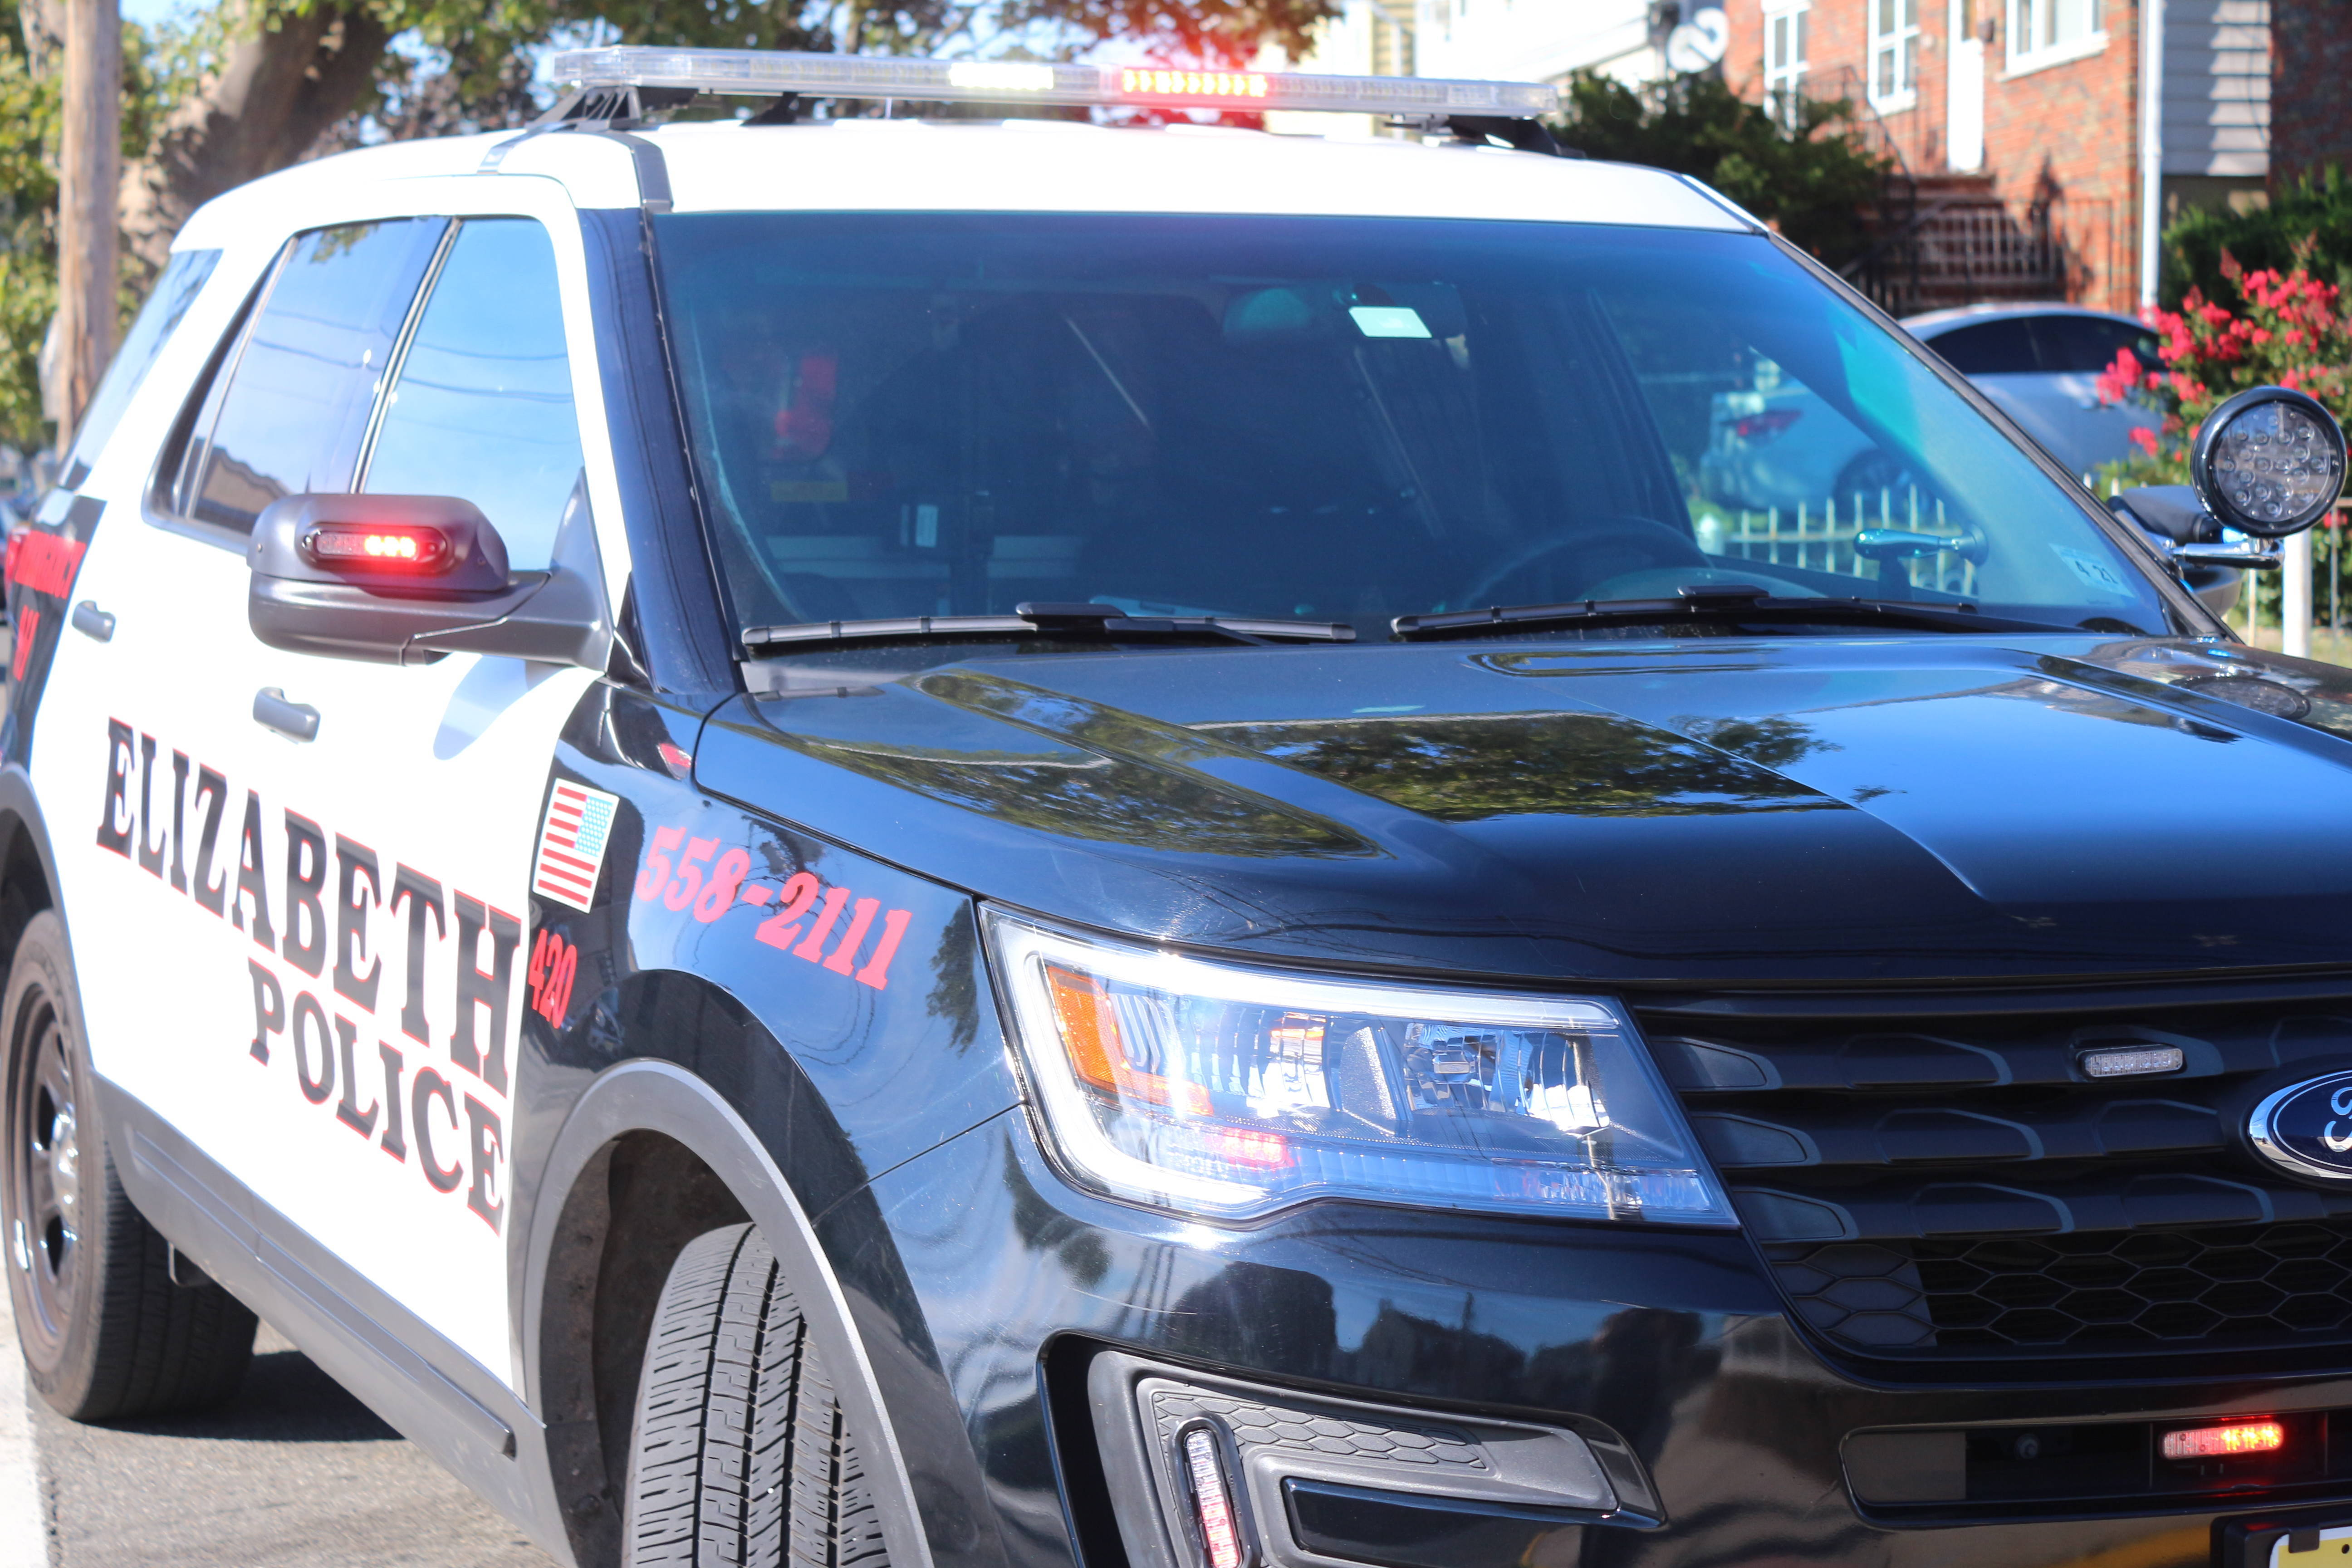 ca62ada4c26d98c62cb7_elizabeth_police_car.JPG